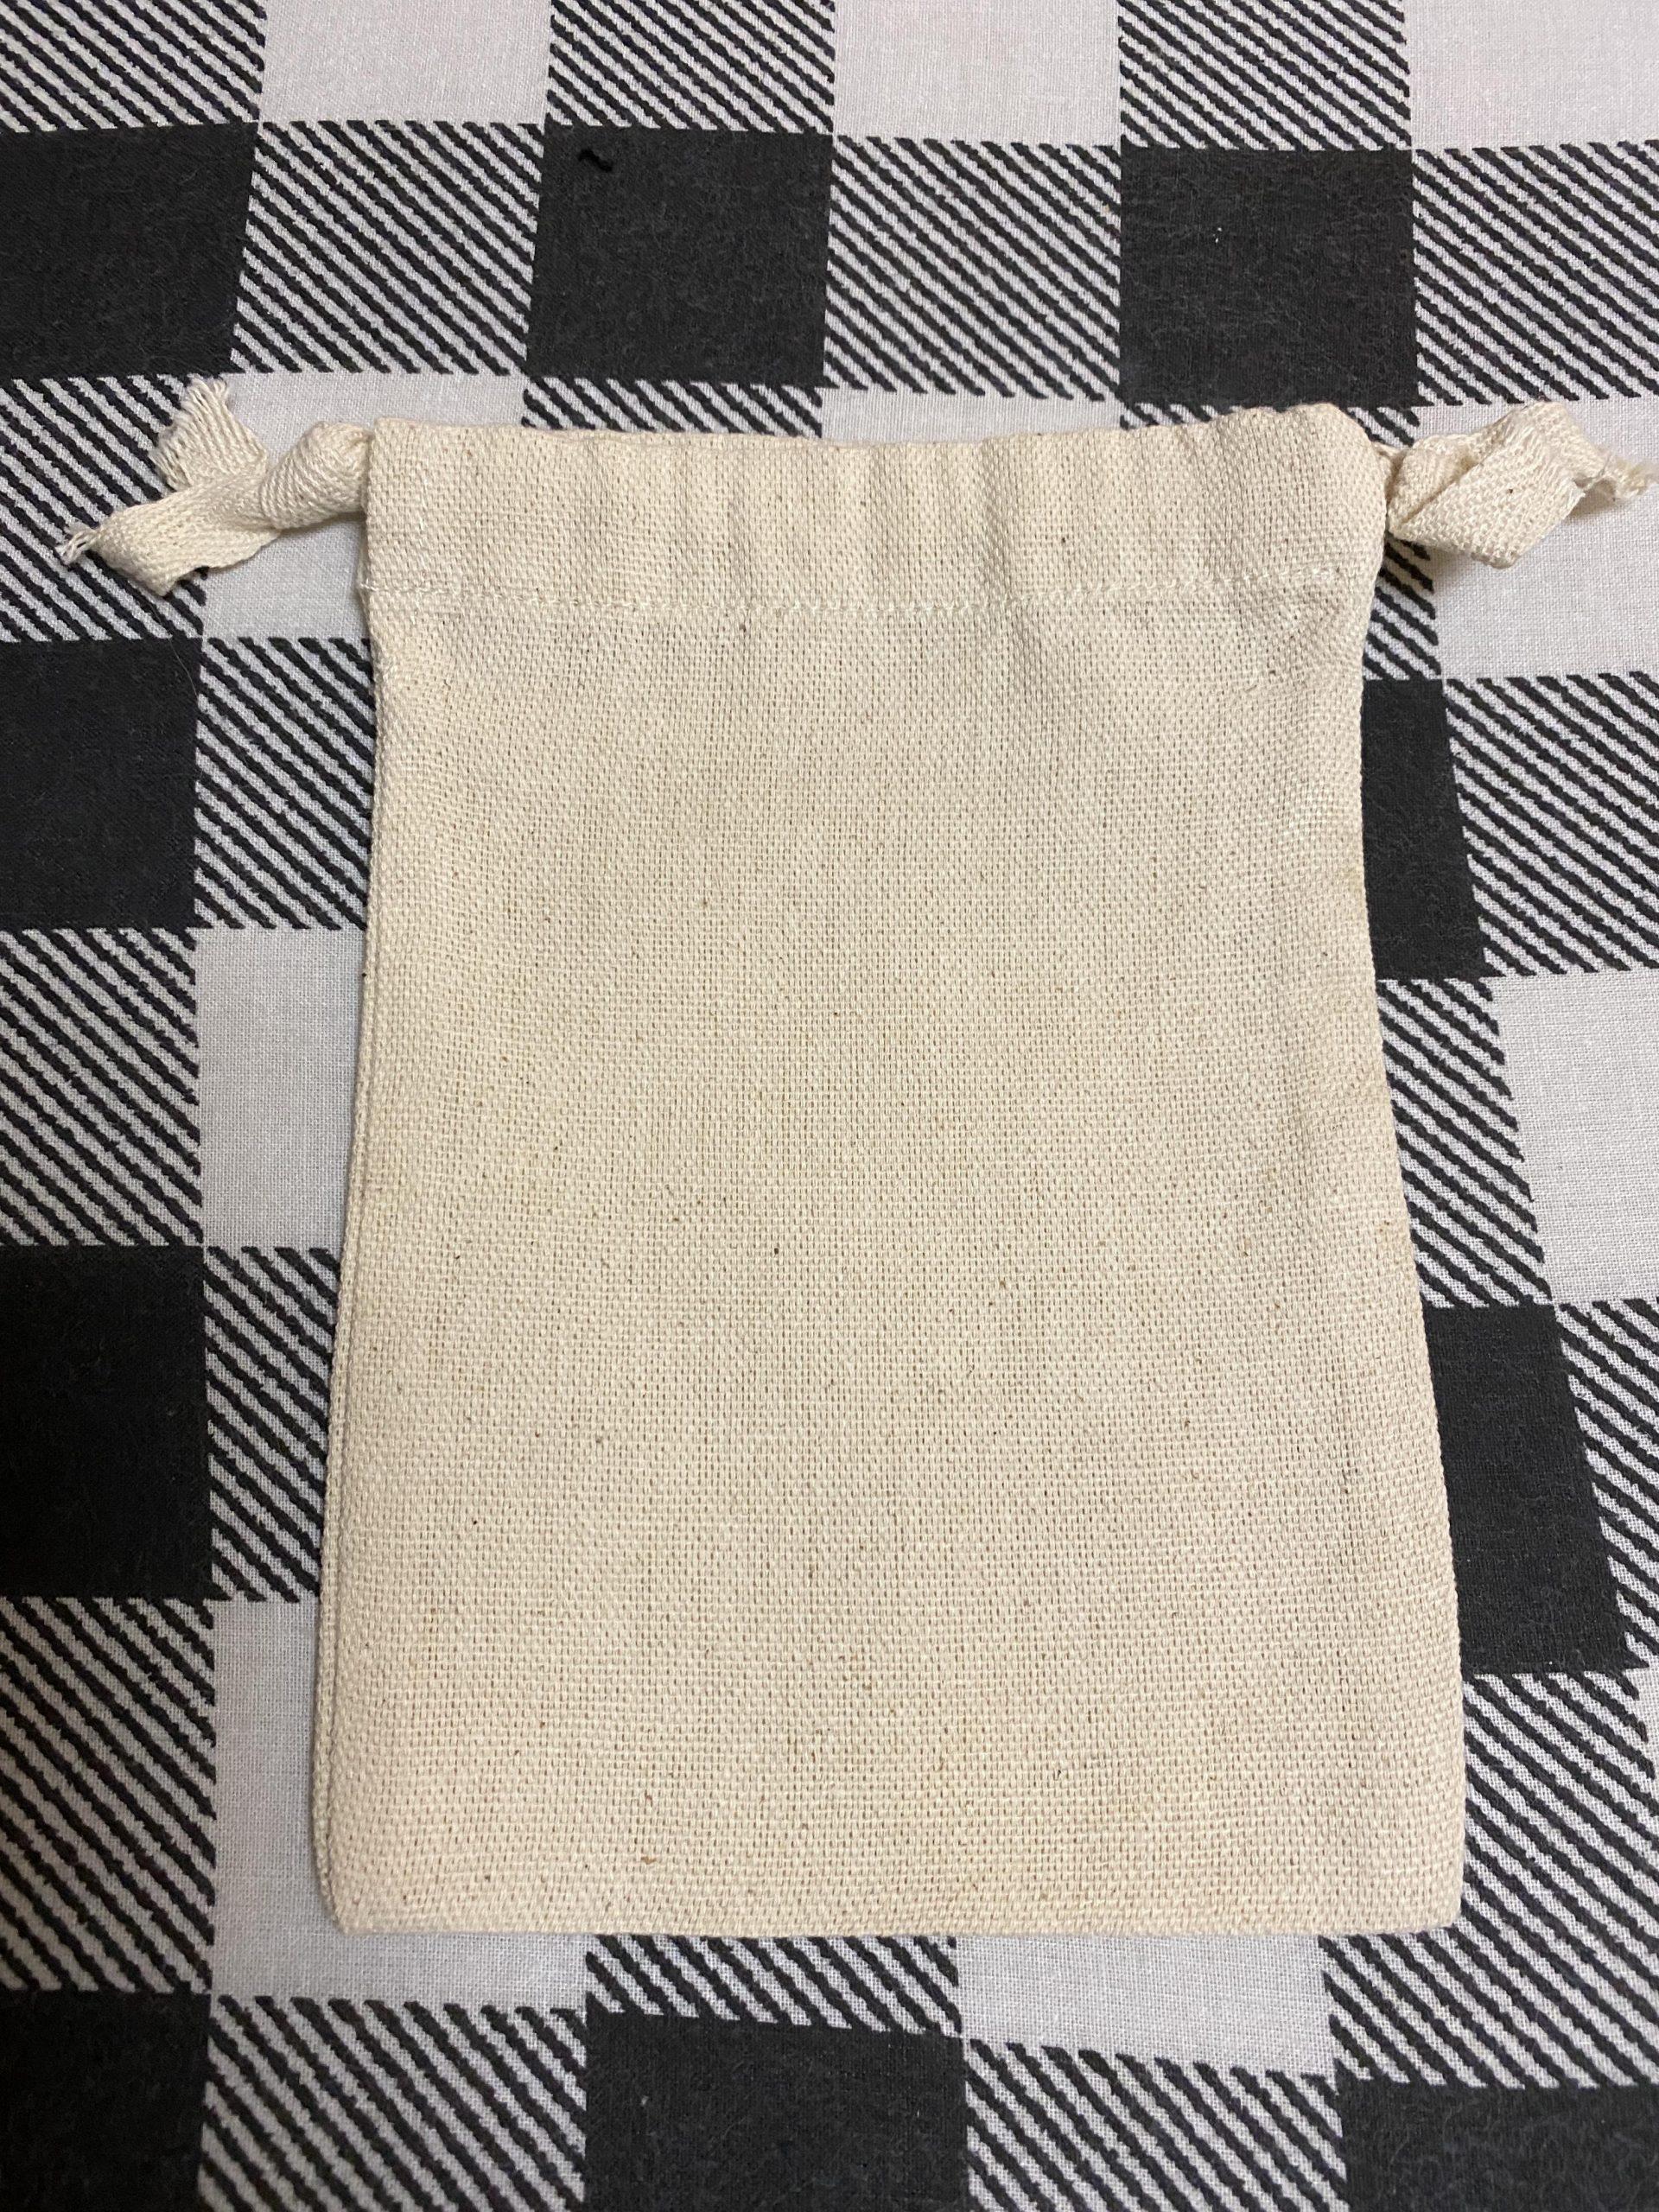 Muslin Drawstring Bag